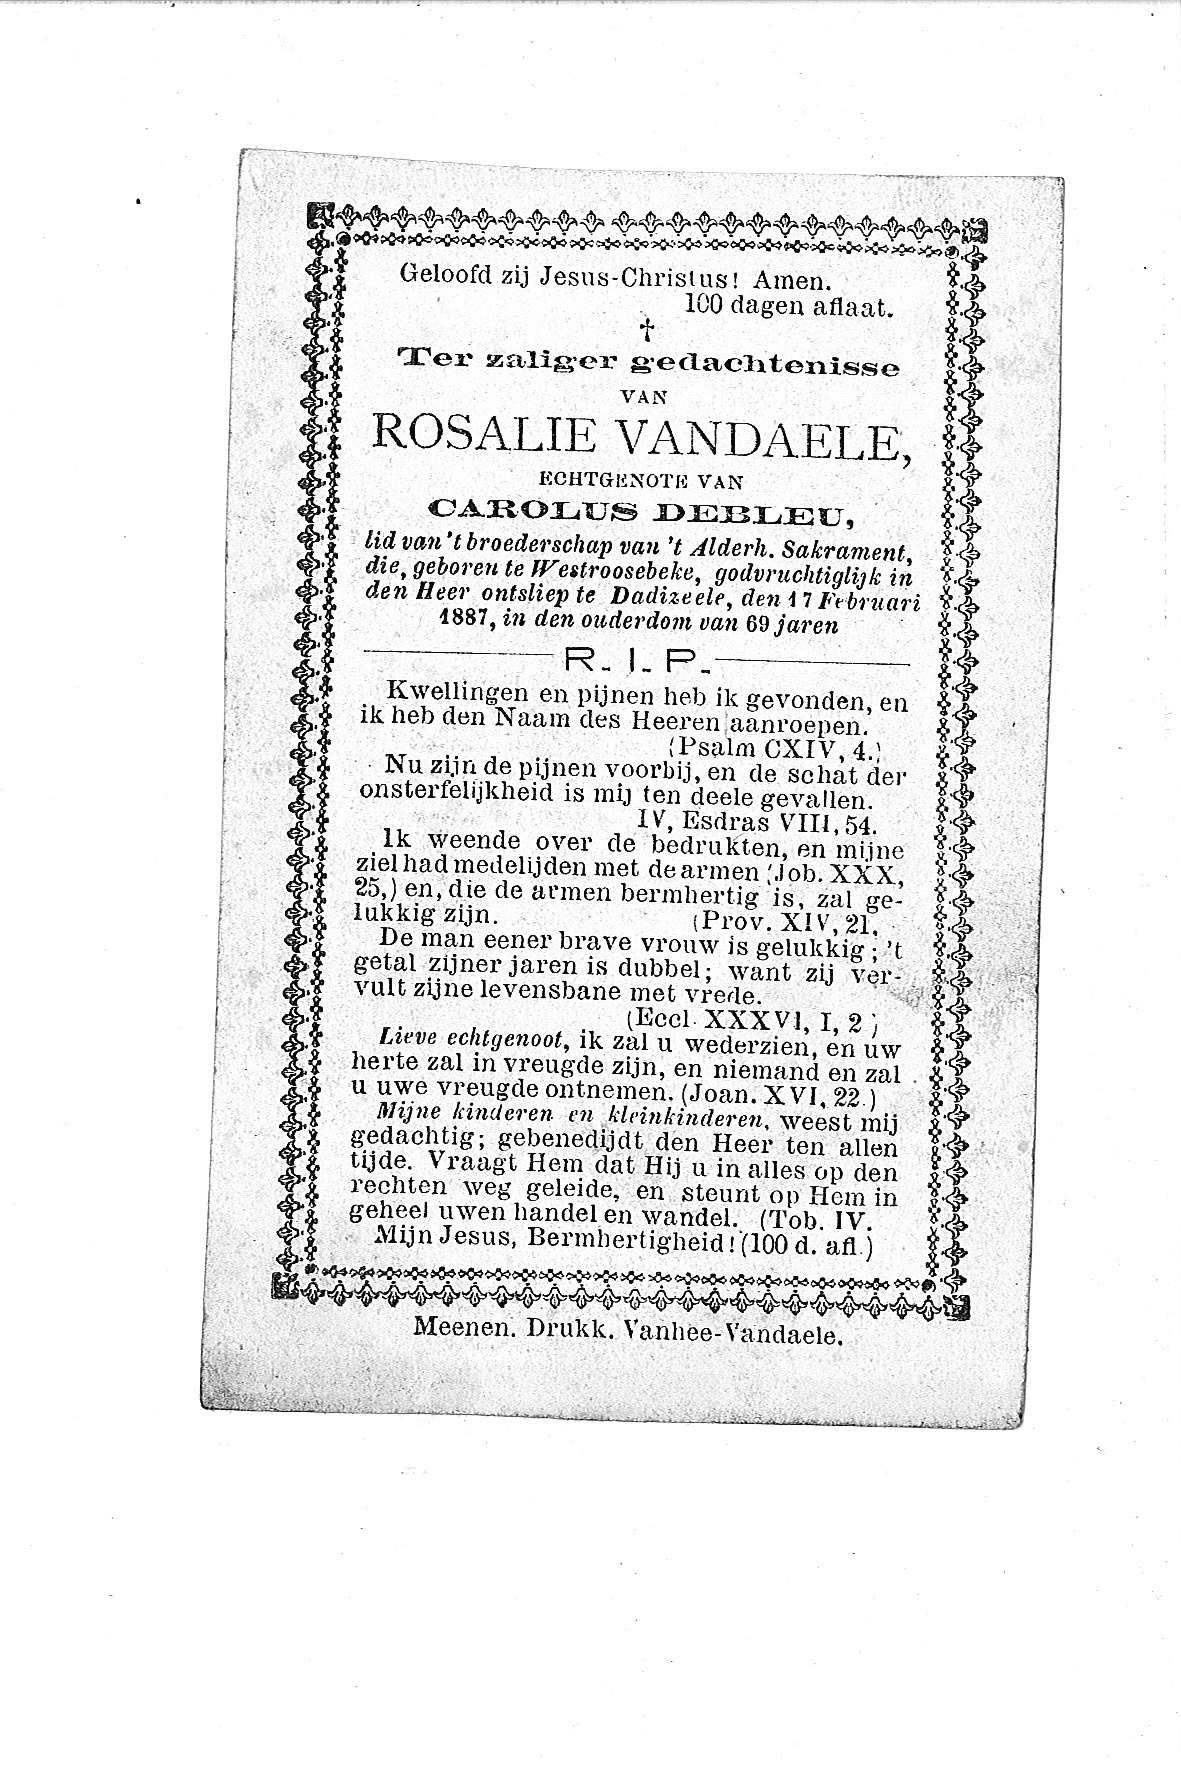 Rosalie(1887)20091211103320_00016.jpg